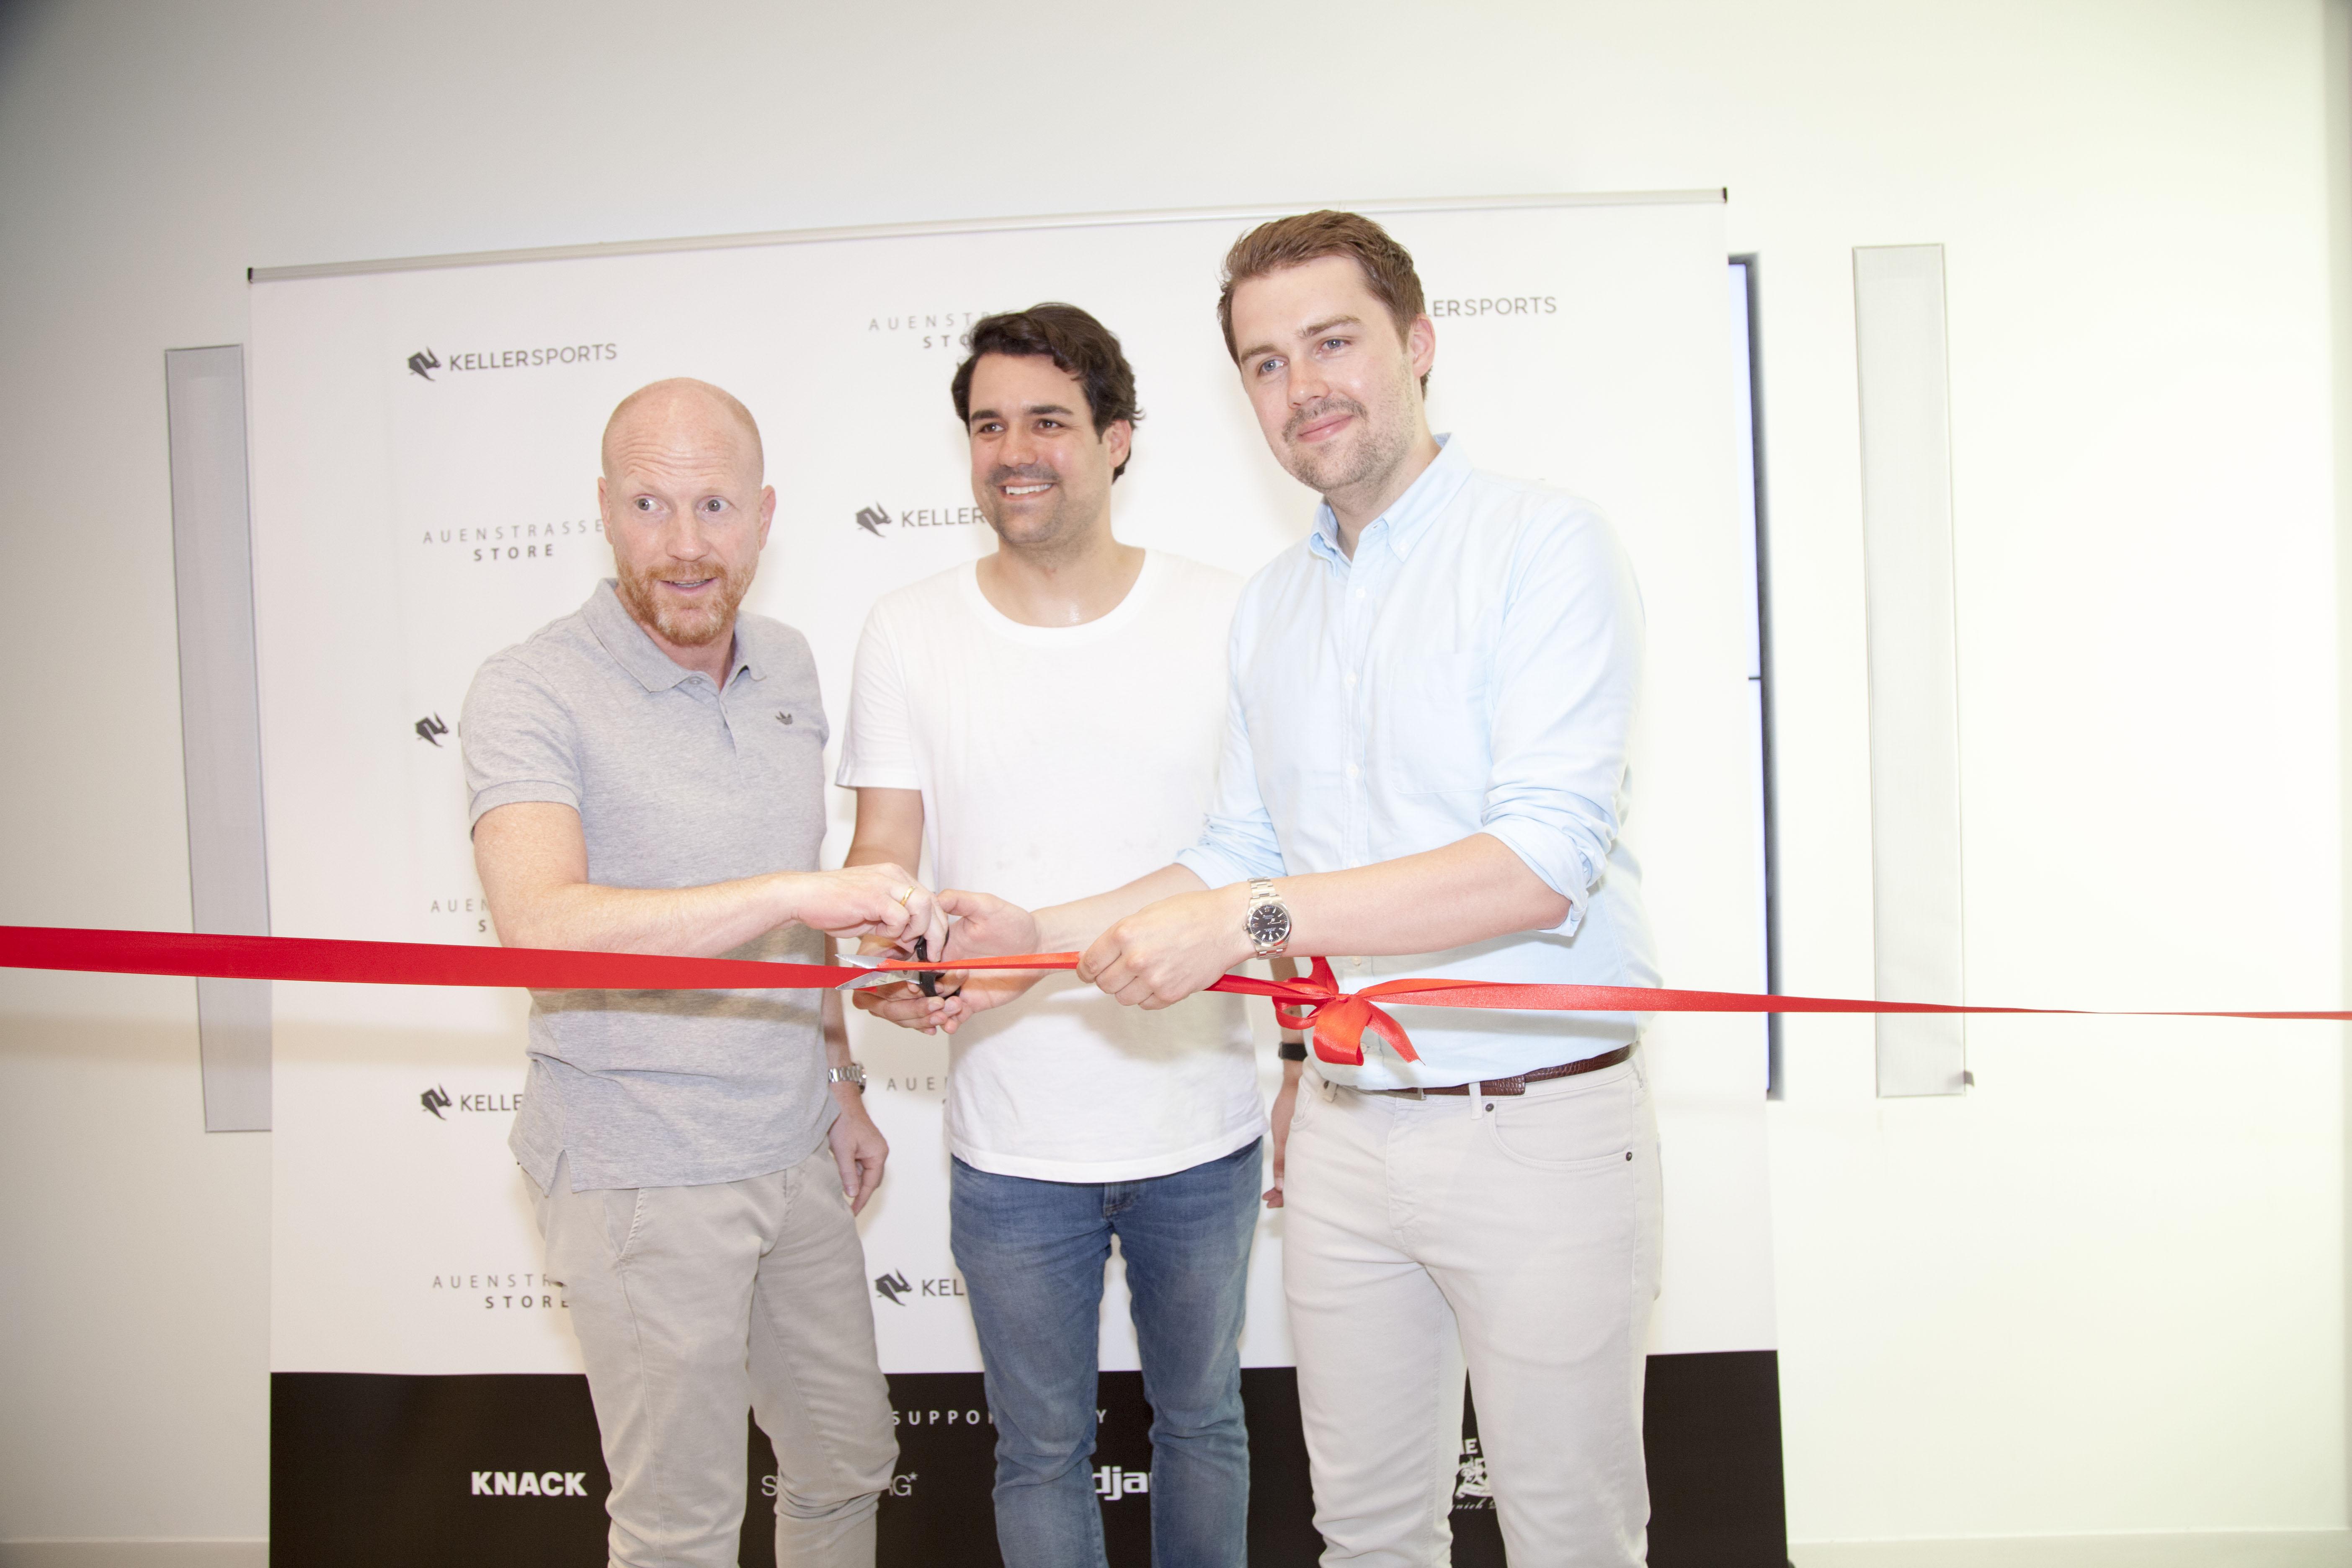 Erster Keller Sports Store eröffnet in München